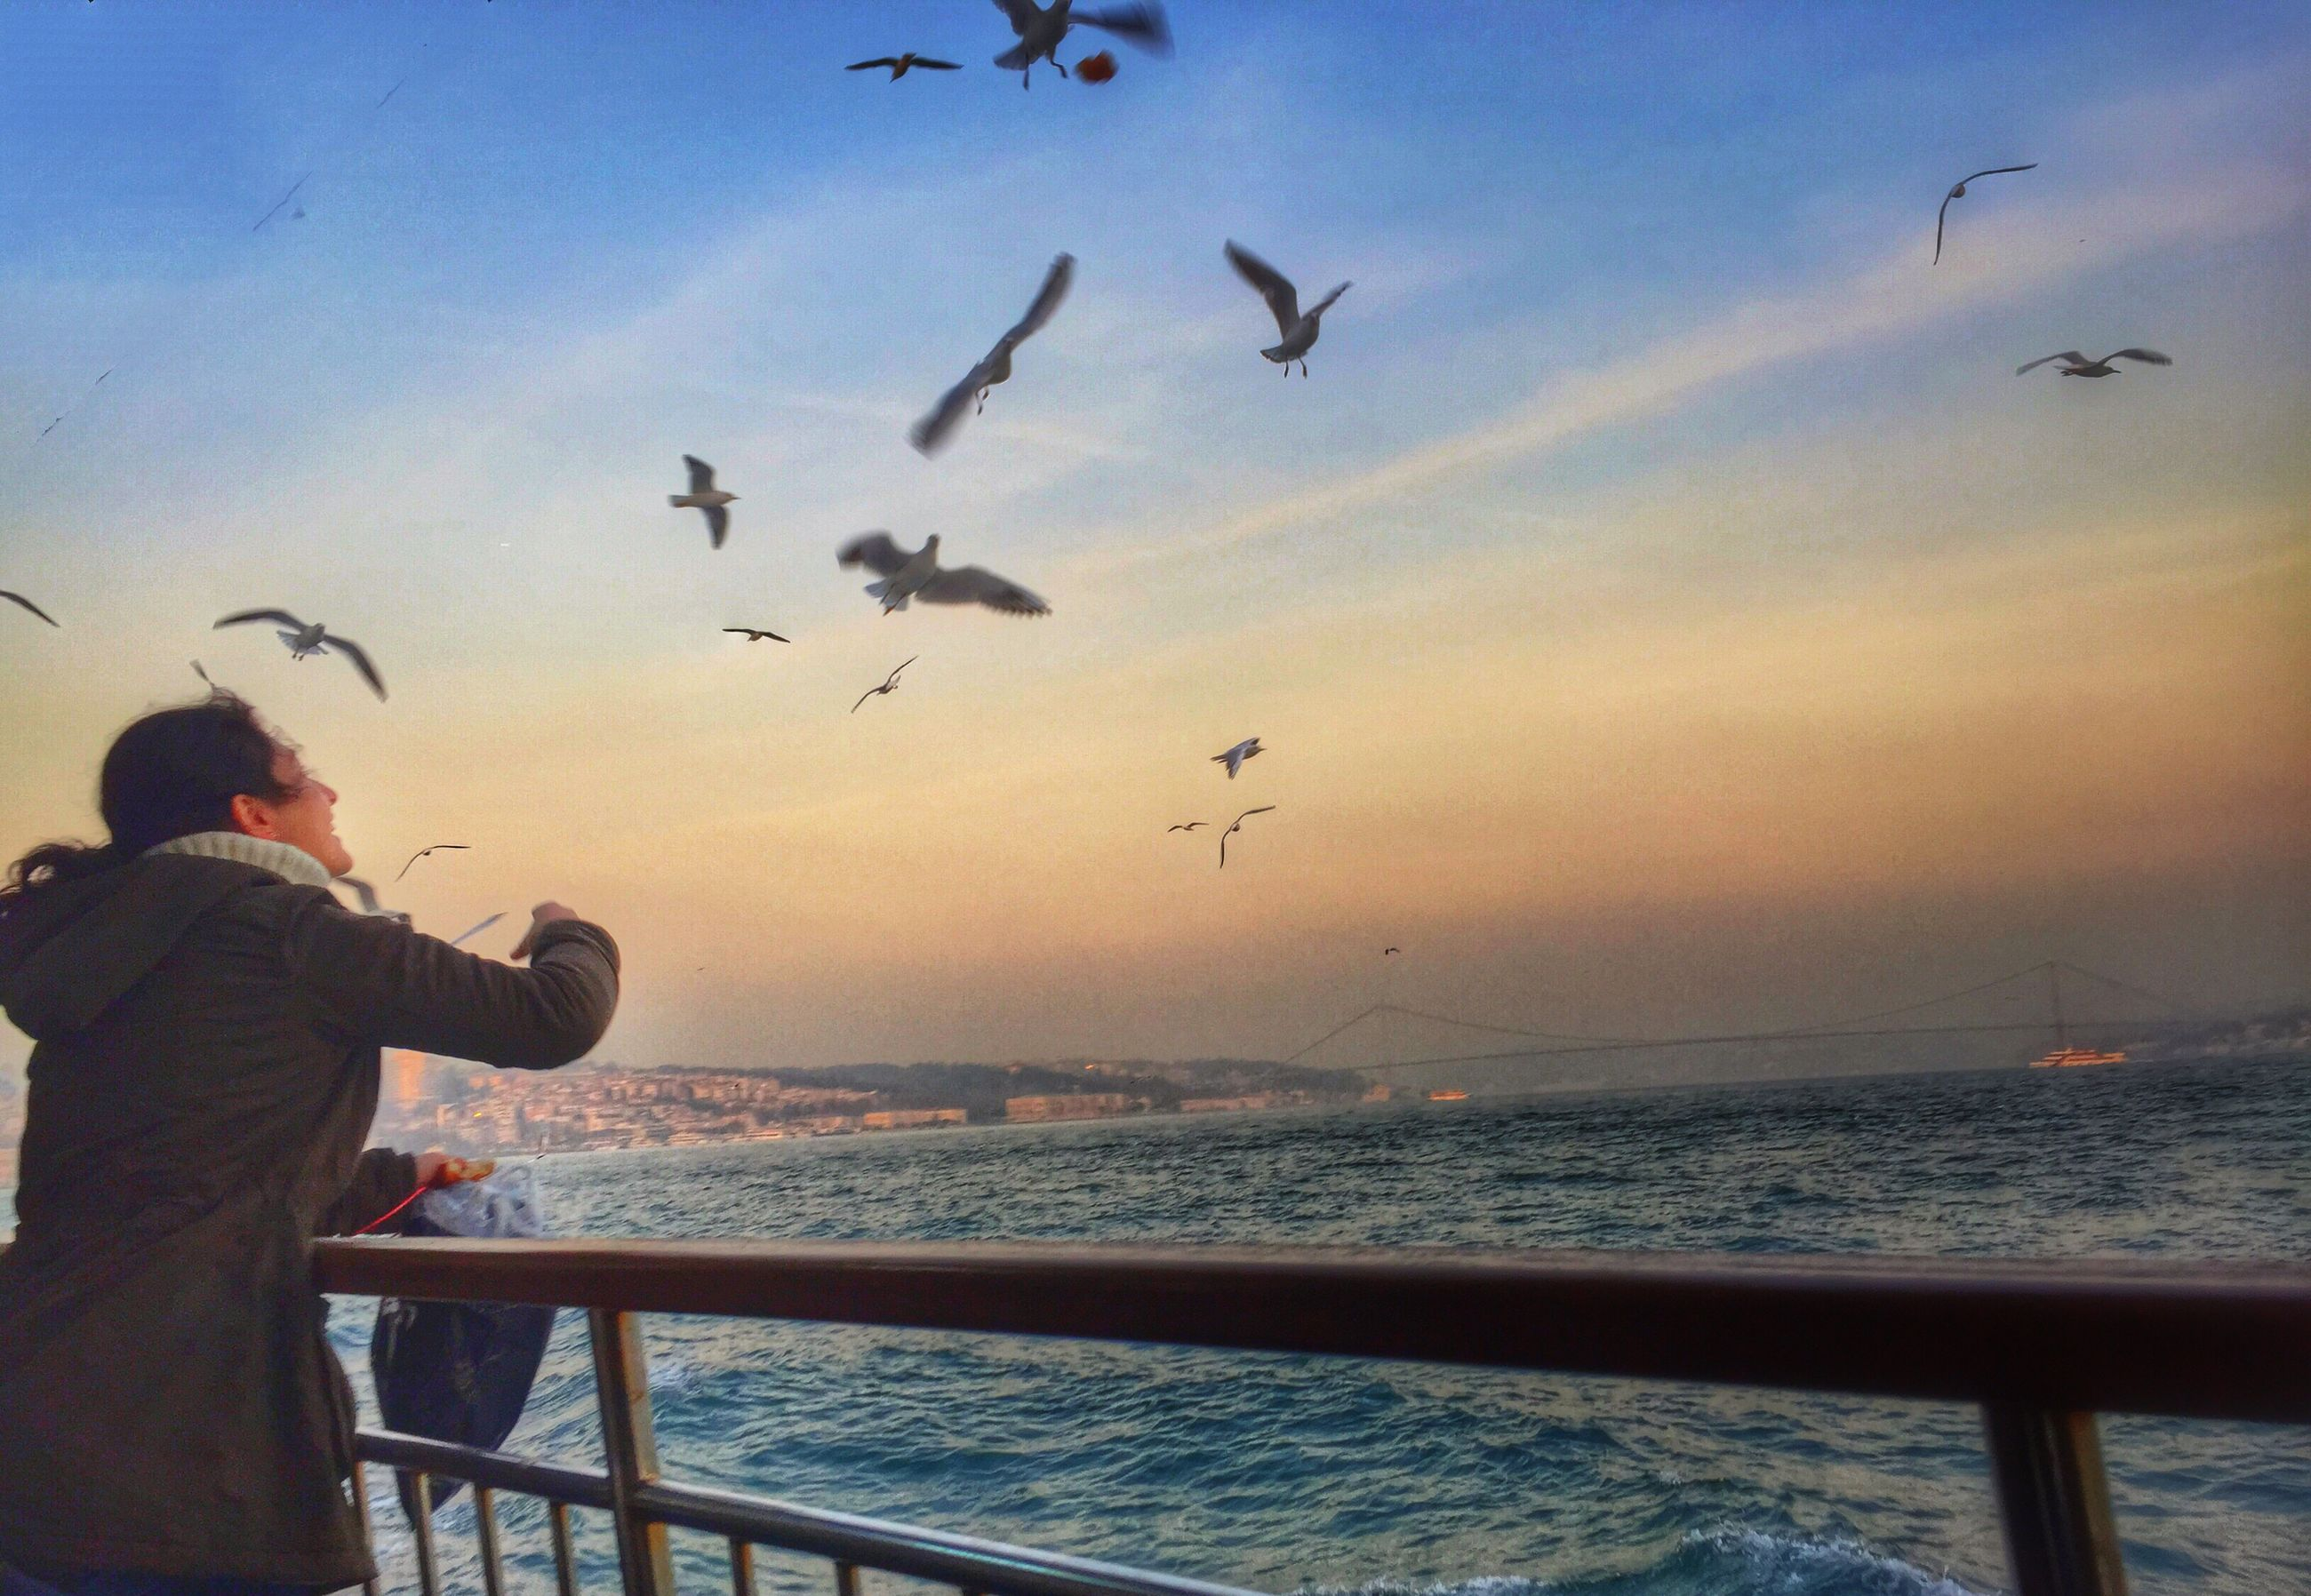 bird, sea, animals in the wild, animal themes, water, flying, wildlife, horizon over water, sky, flock of birds, silhouette, sunset, beach, nature, scenics, seagull, lifestyles